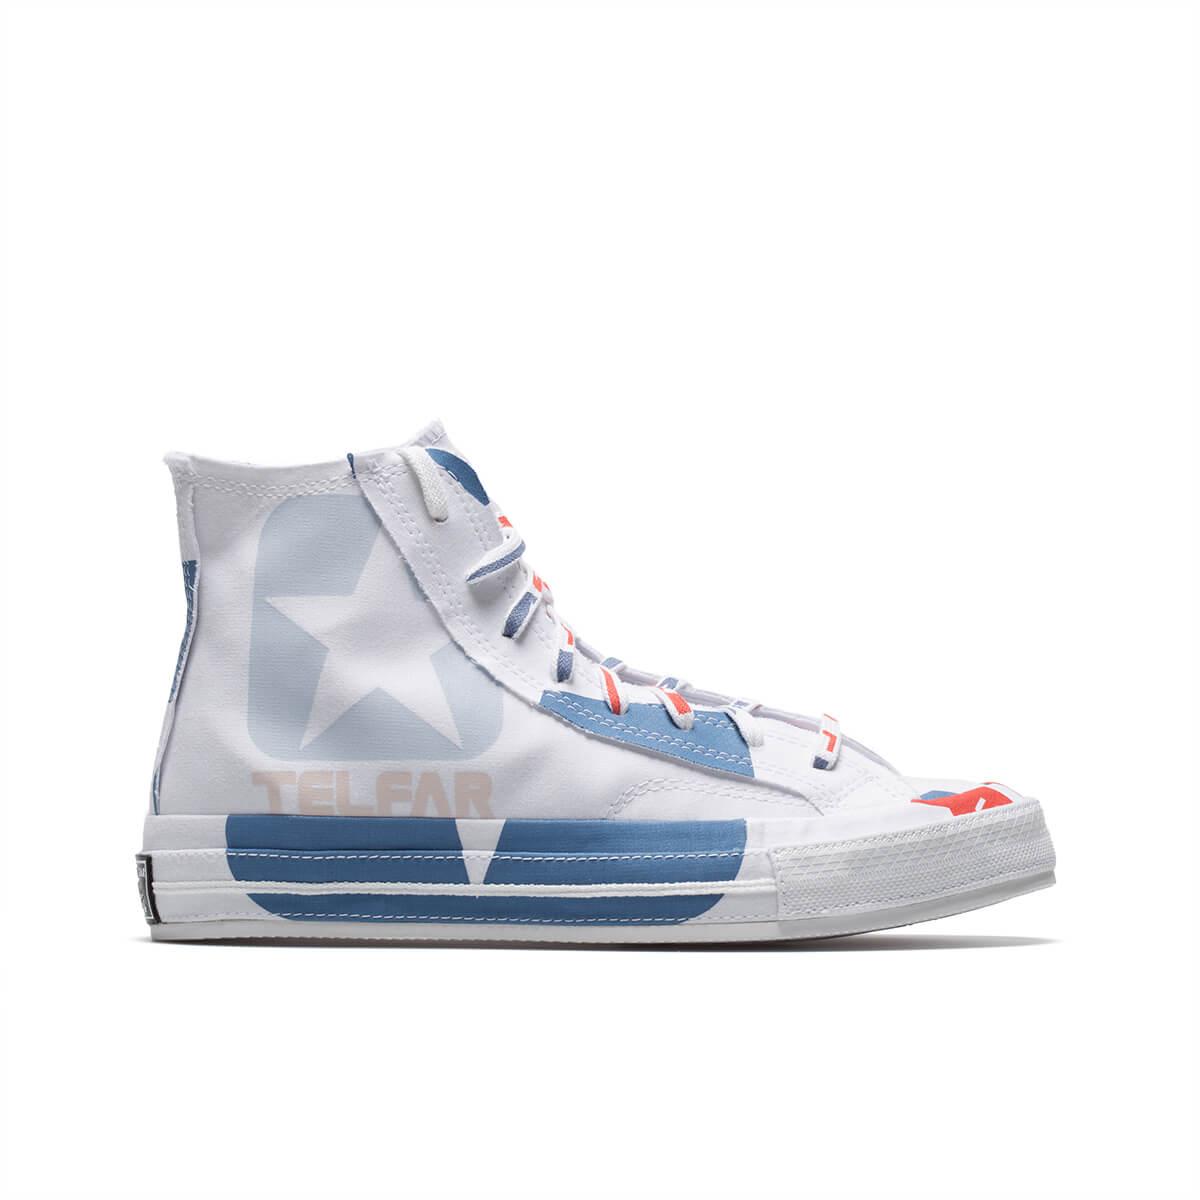 Telfar Shoes CHUCK 70 HI